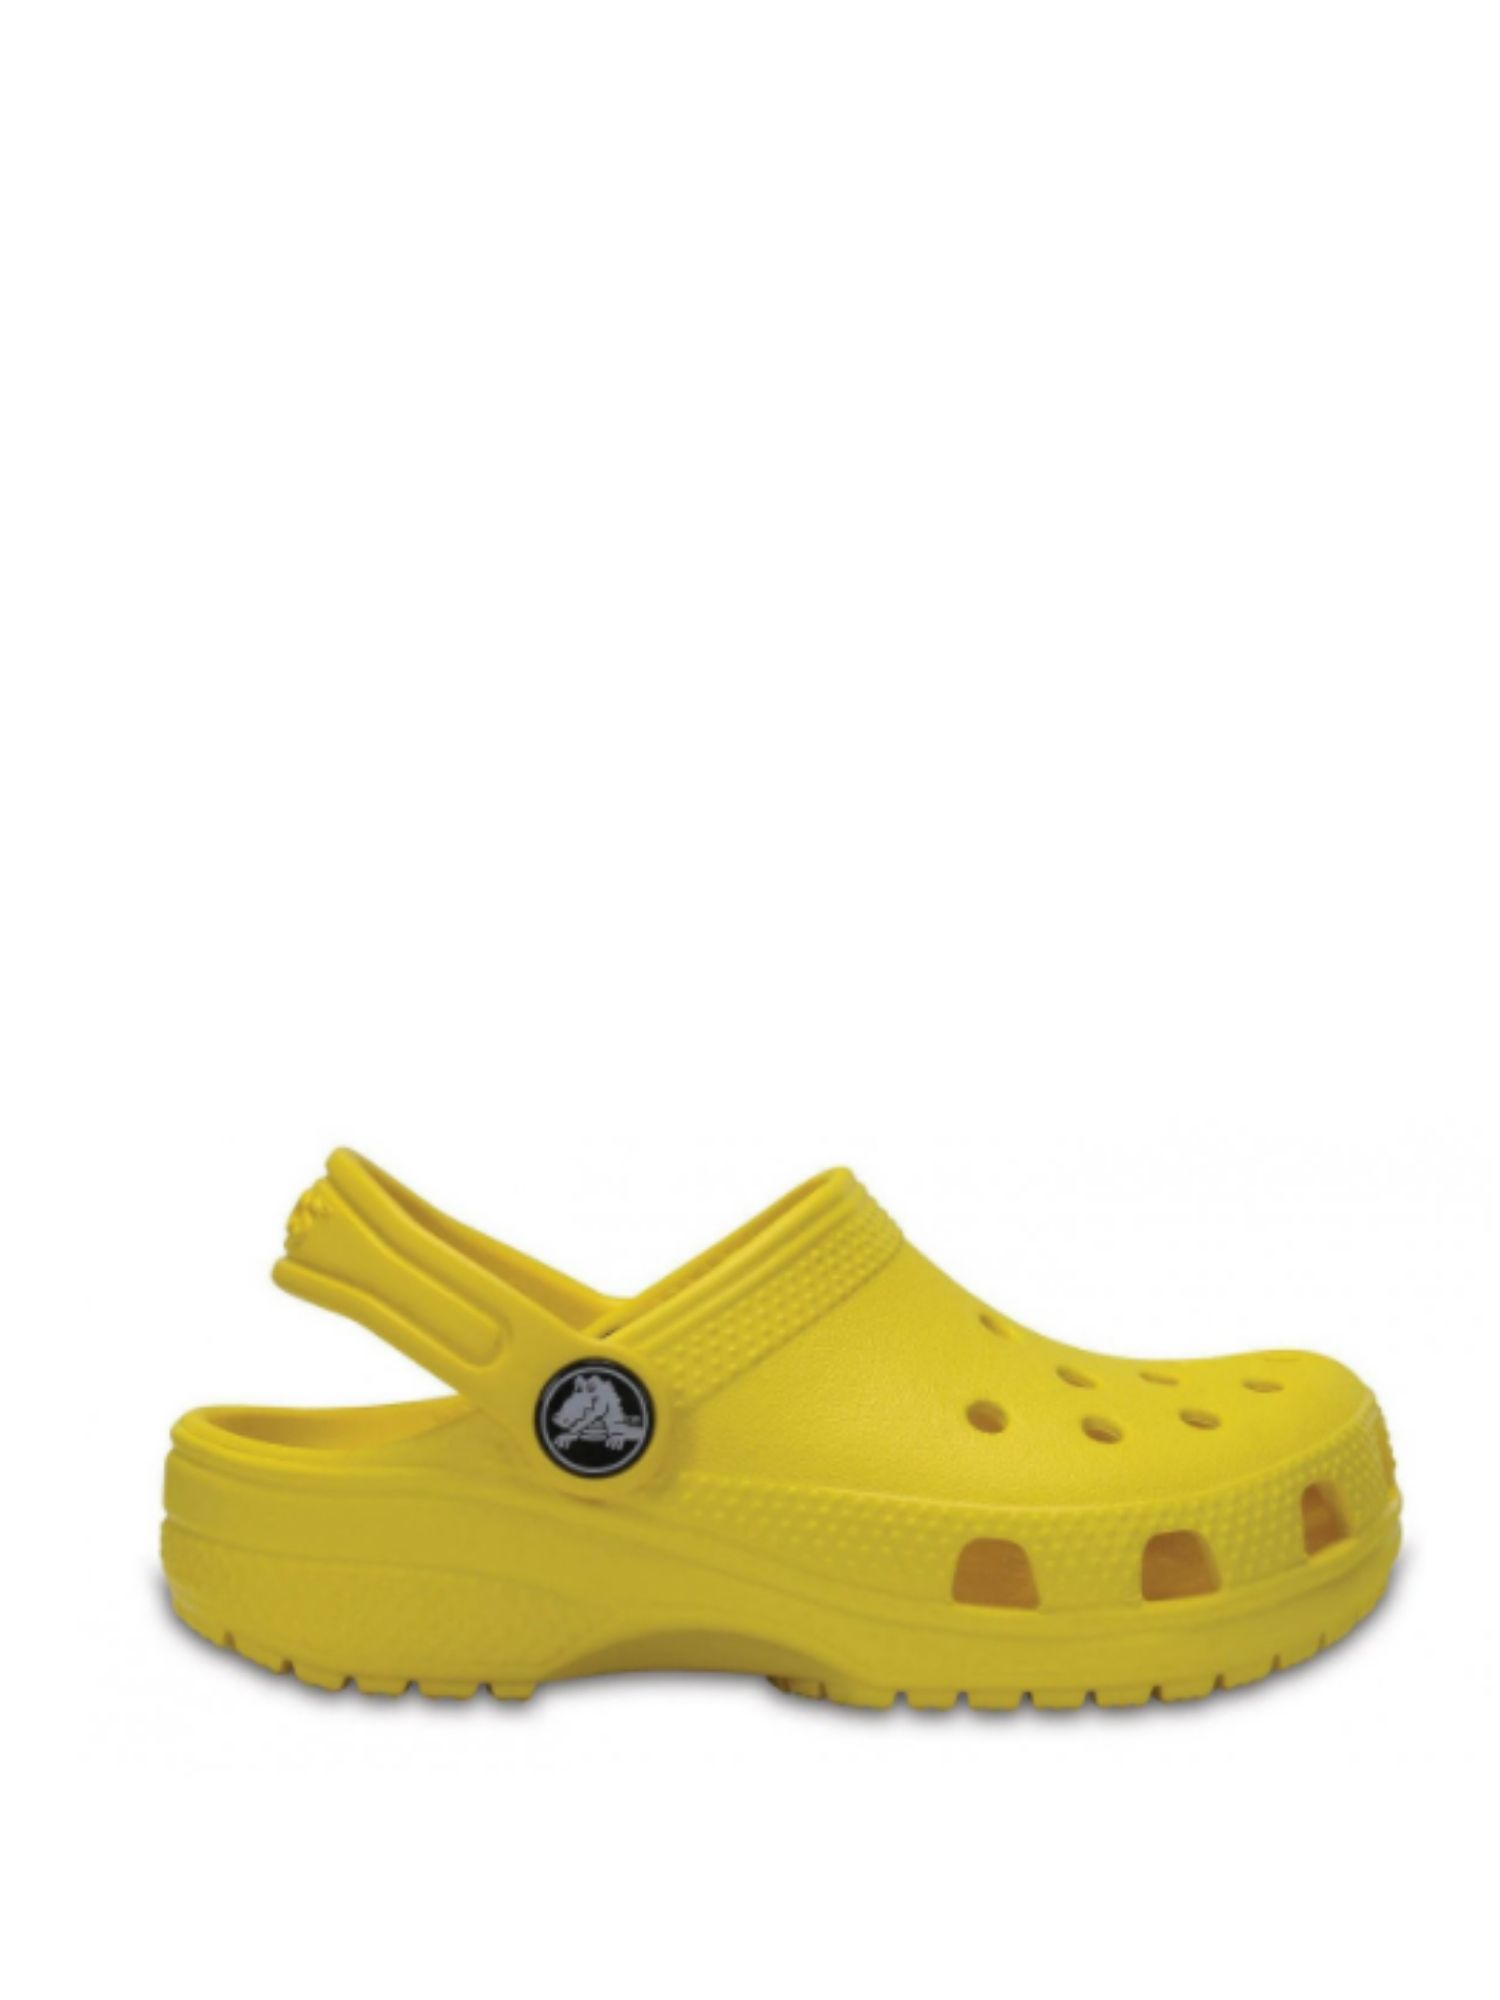 Sabot Crocs Bambino Classic Clog K 204536 Lemon